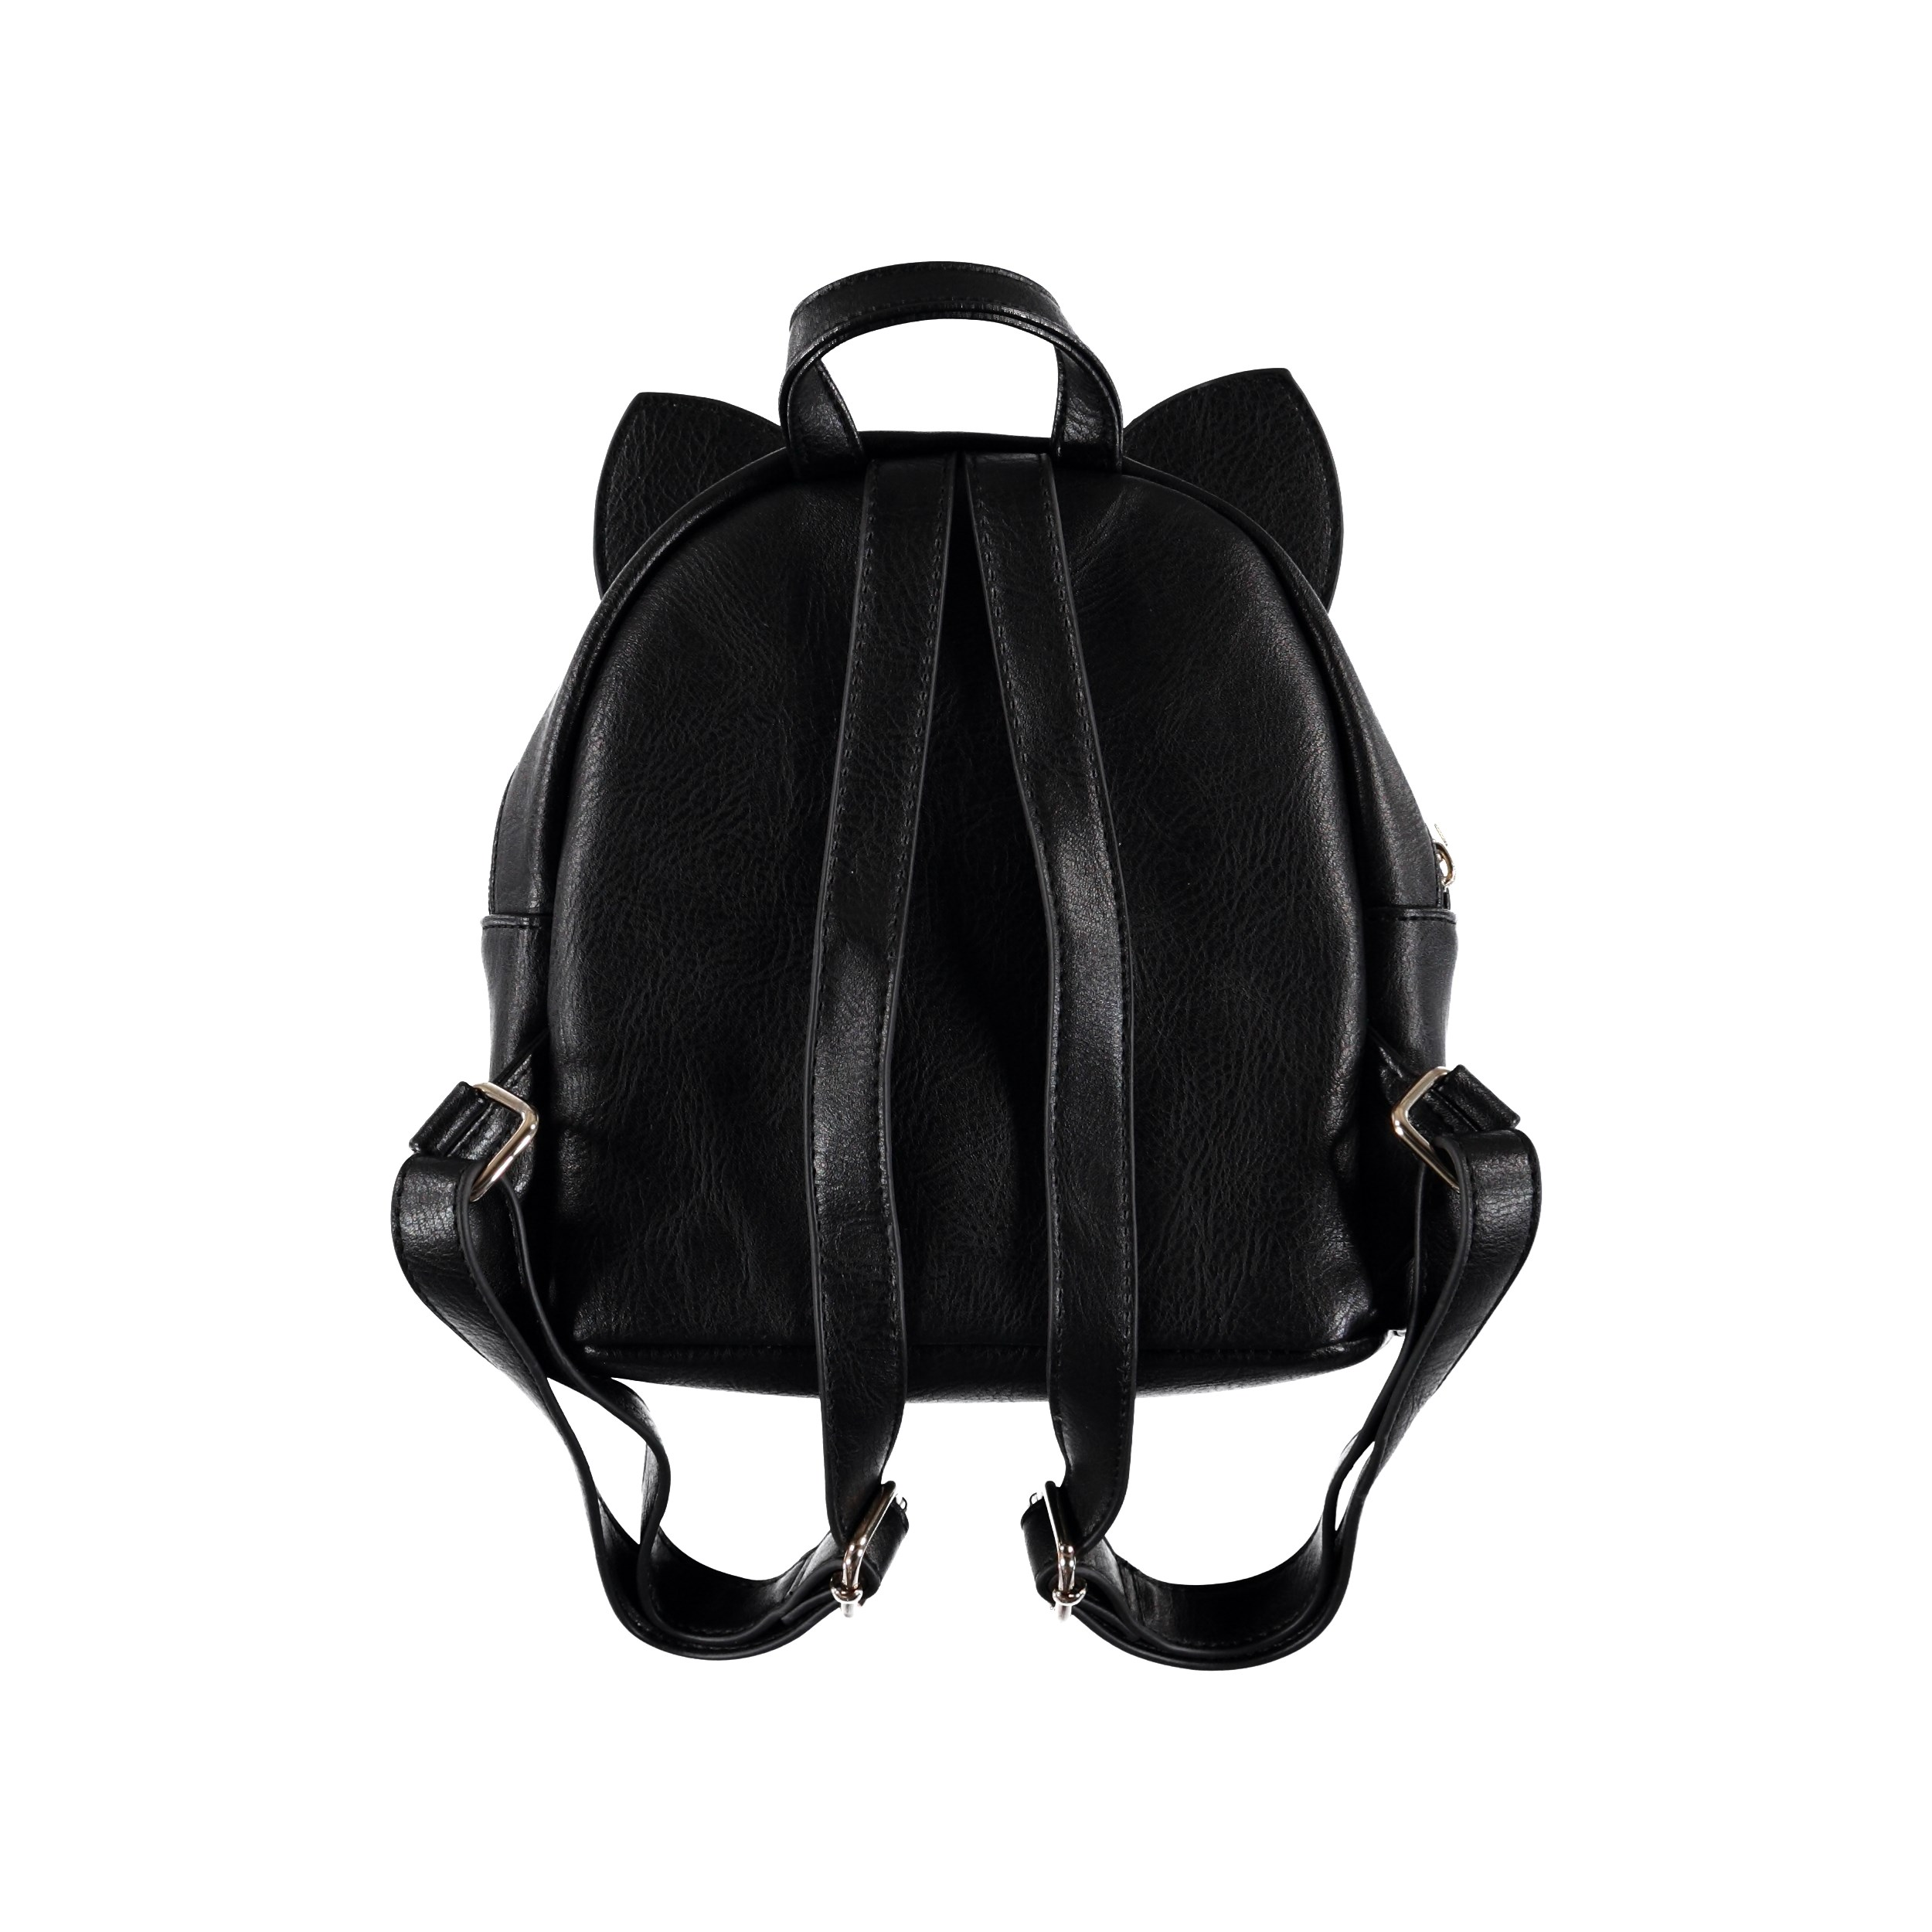 Multifonctions/_Tote Bag/_Pochette Black Kitten T\u00e9l\u00e9phone/_Protection T\u00e9l\u00e9phone/_Protection T\u00e9l\u00e9phone/_Protection T\u00e9l\u00e9phone/_Protection Pattern Bling/_Housse